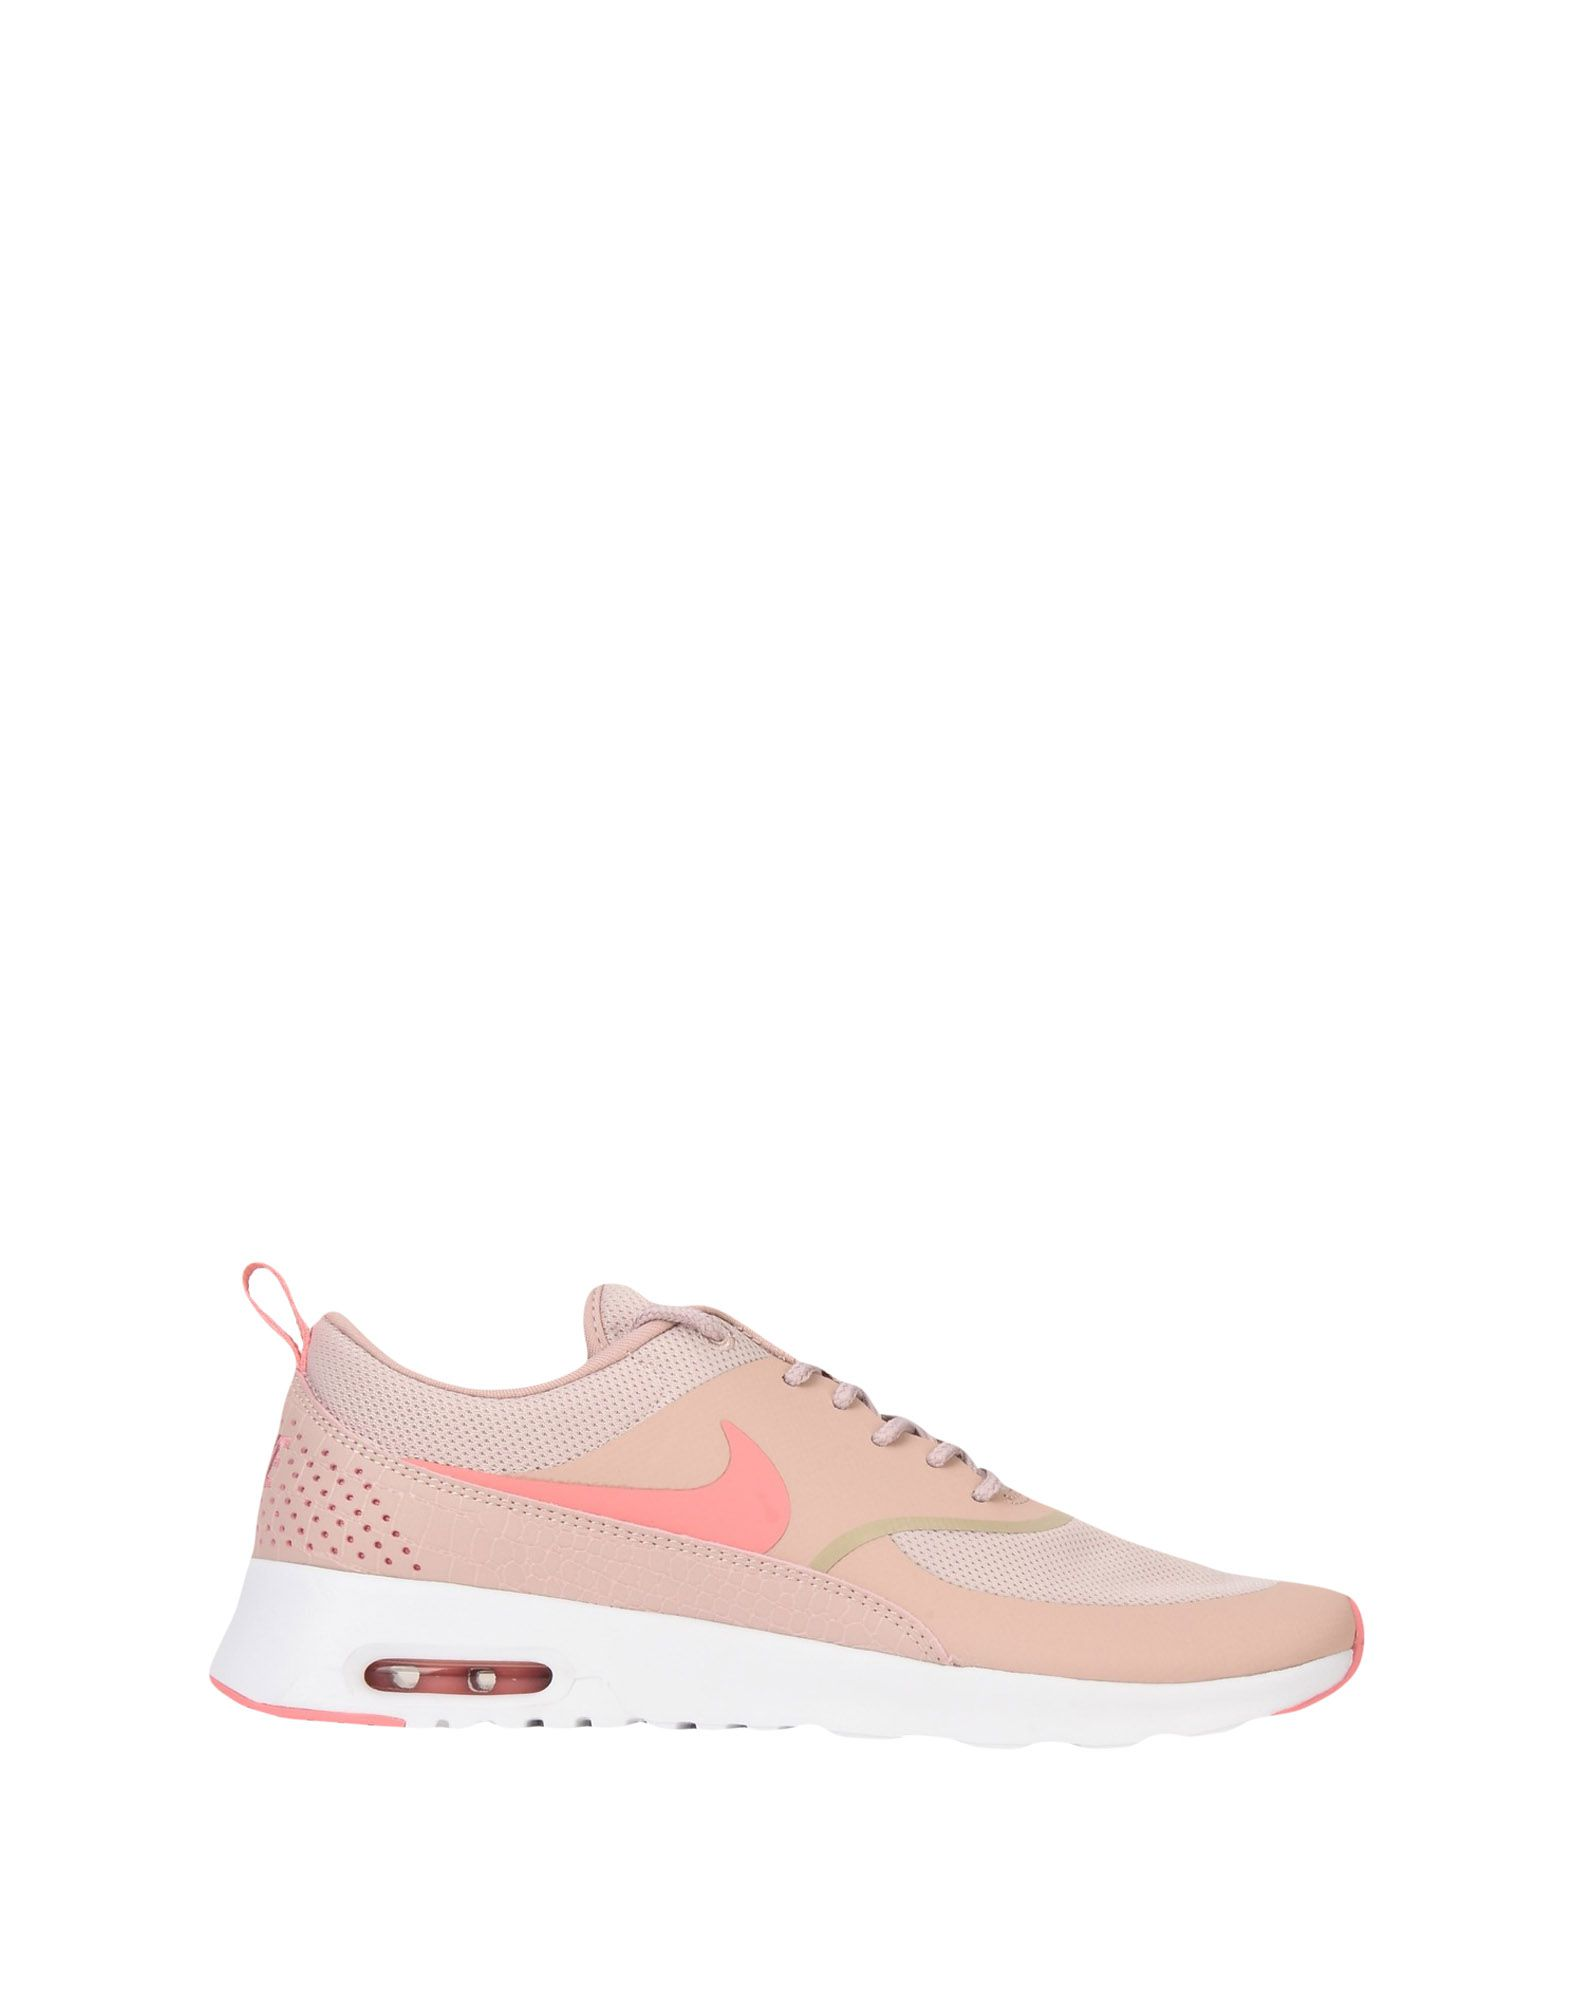 Sneakers Nike    Air Max Thea - Femme - Sneakers Nike sur